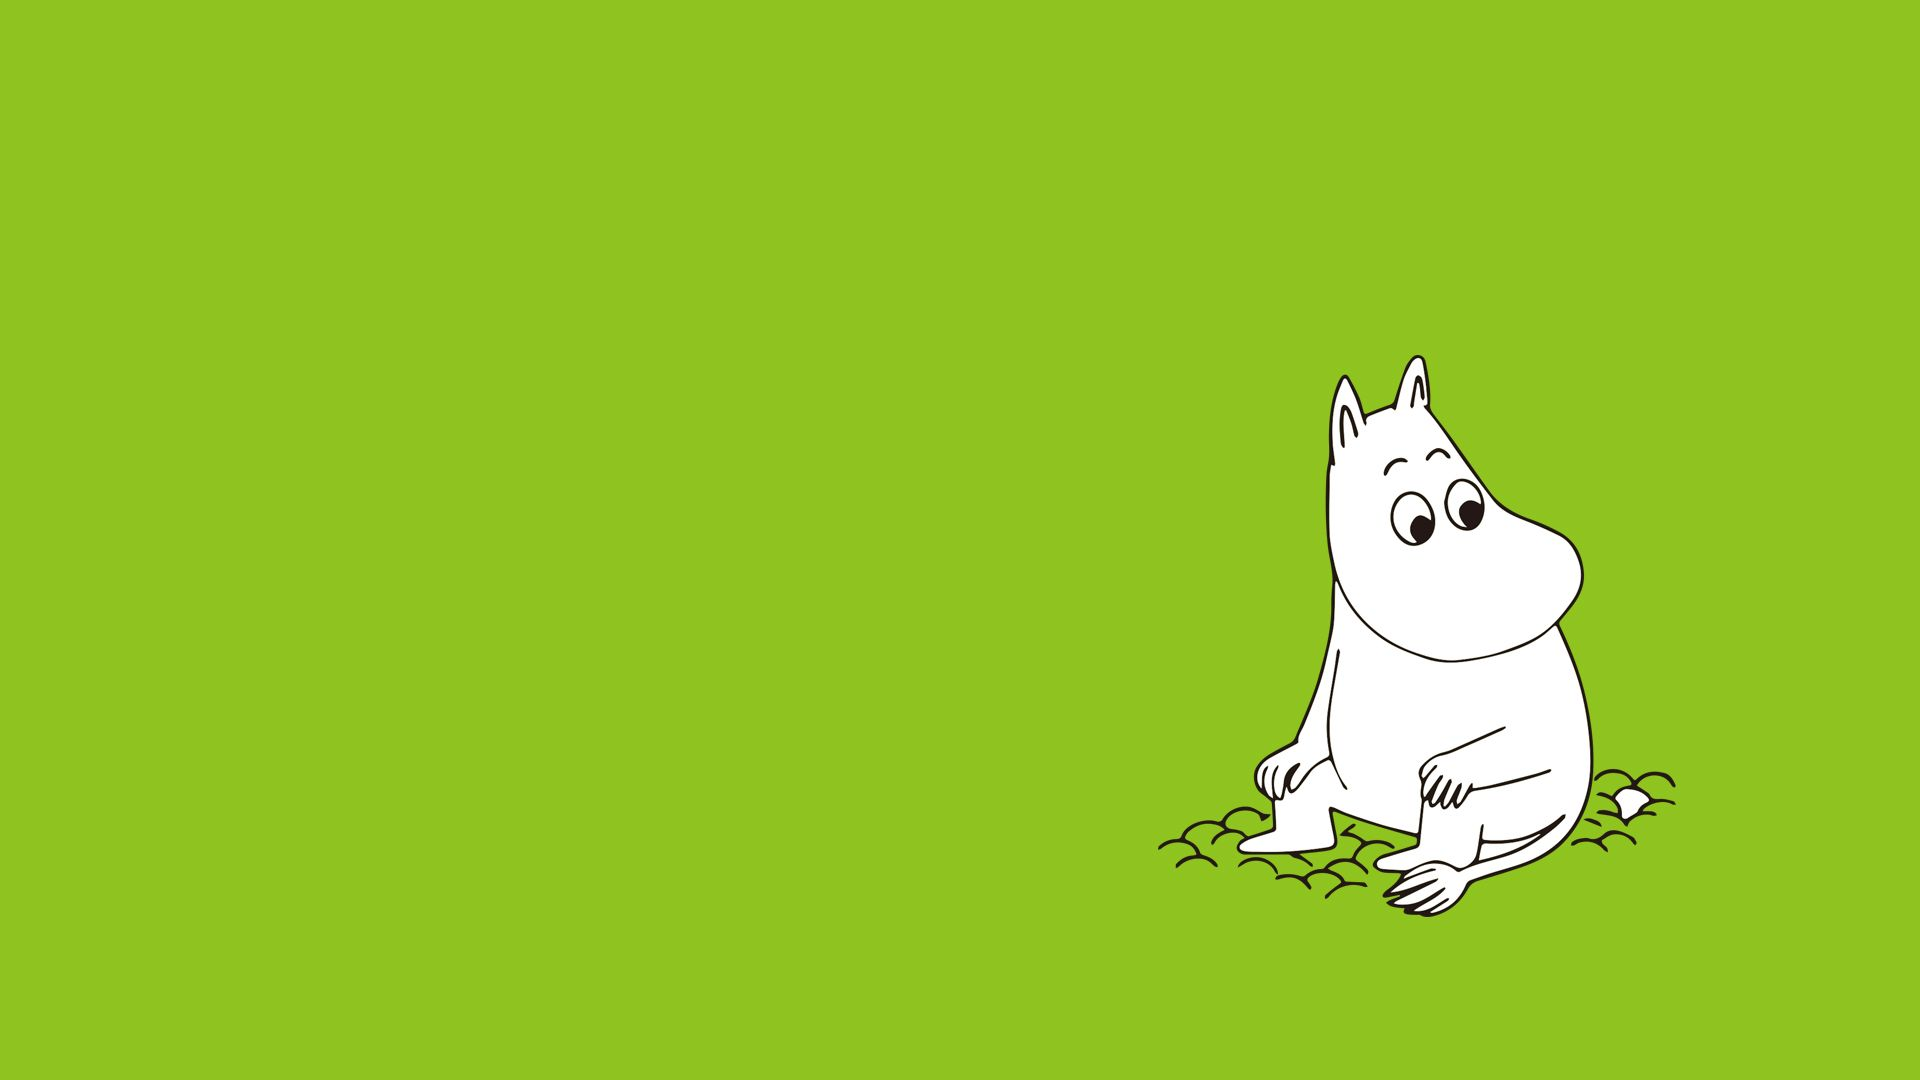 Moomin Desktop Wallpaper Posted By Zoey Mercado